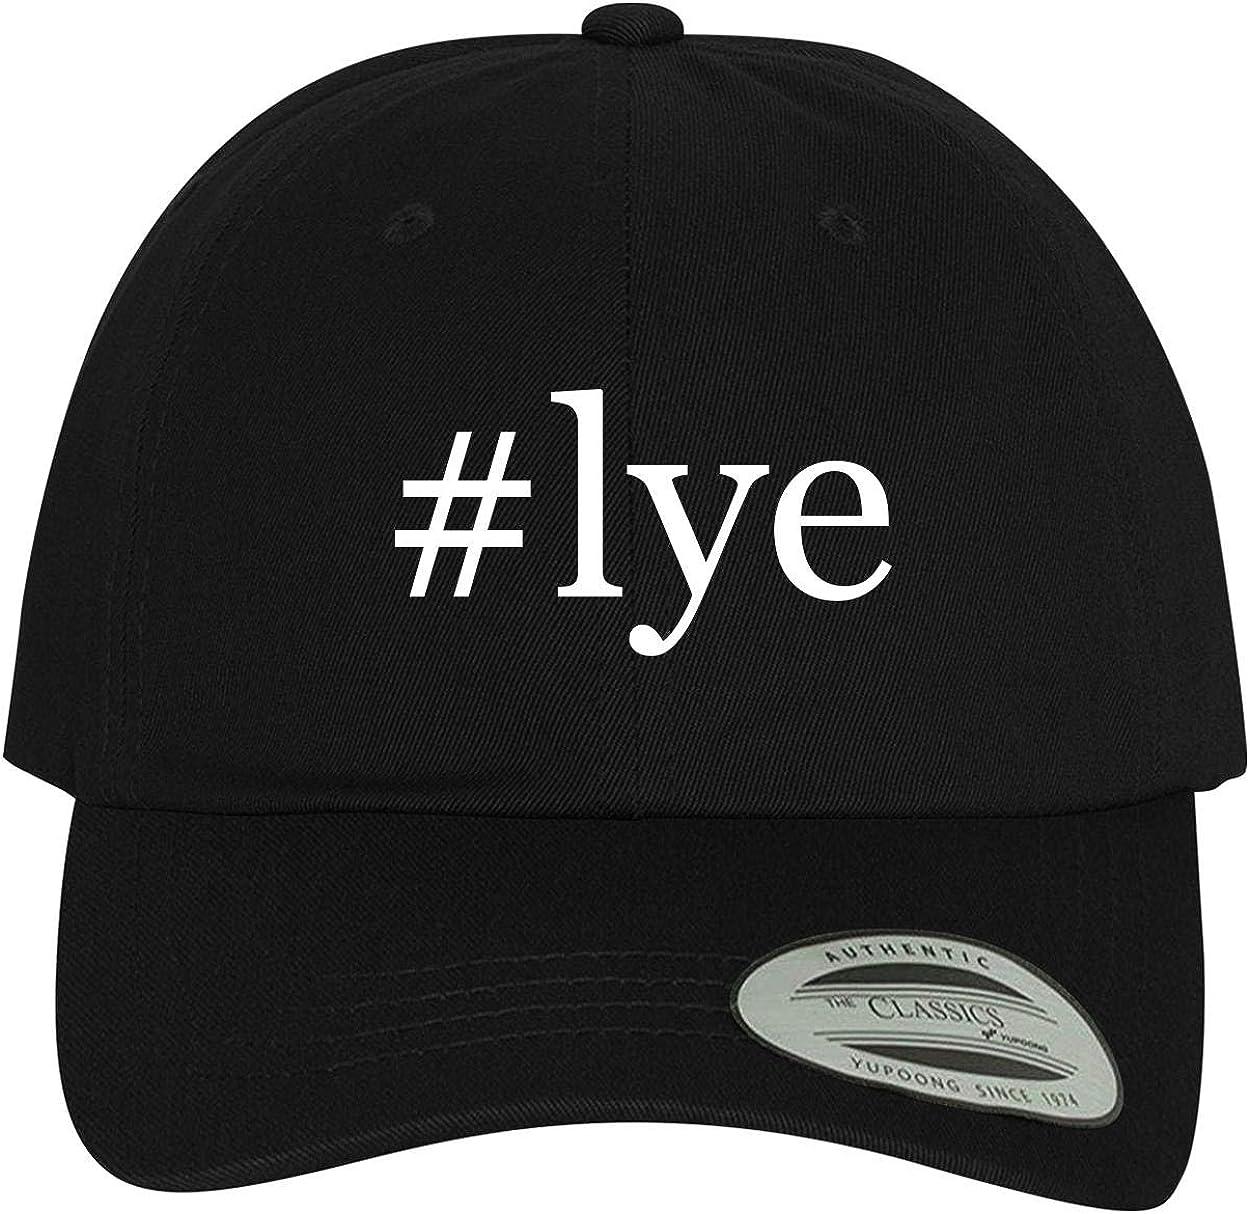 BH Cool Designs #Lye Comfortable Dad Hat Baseball Cap